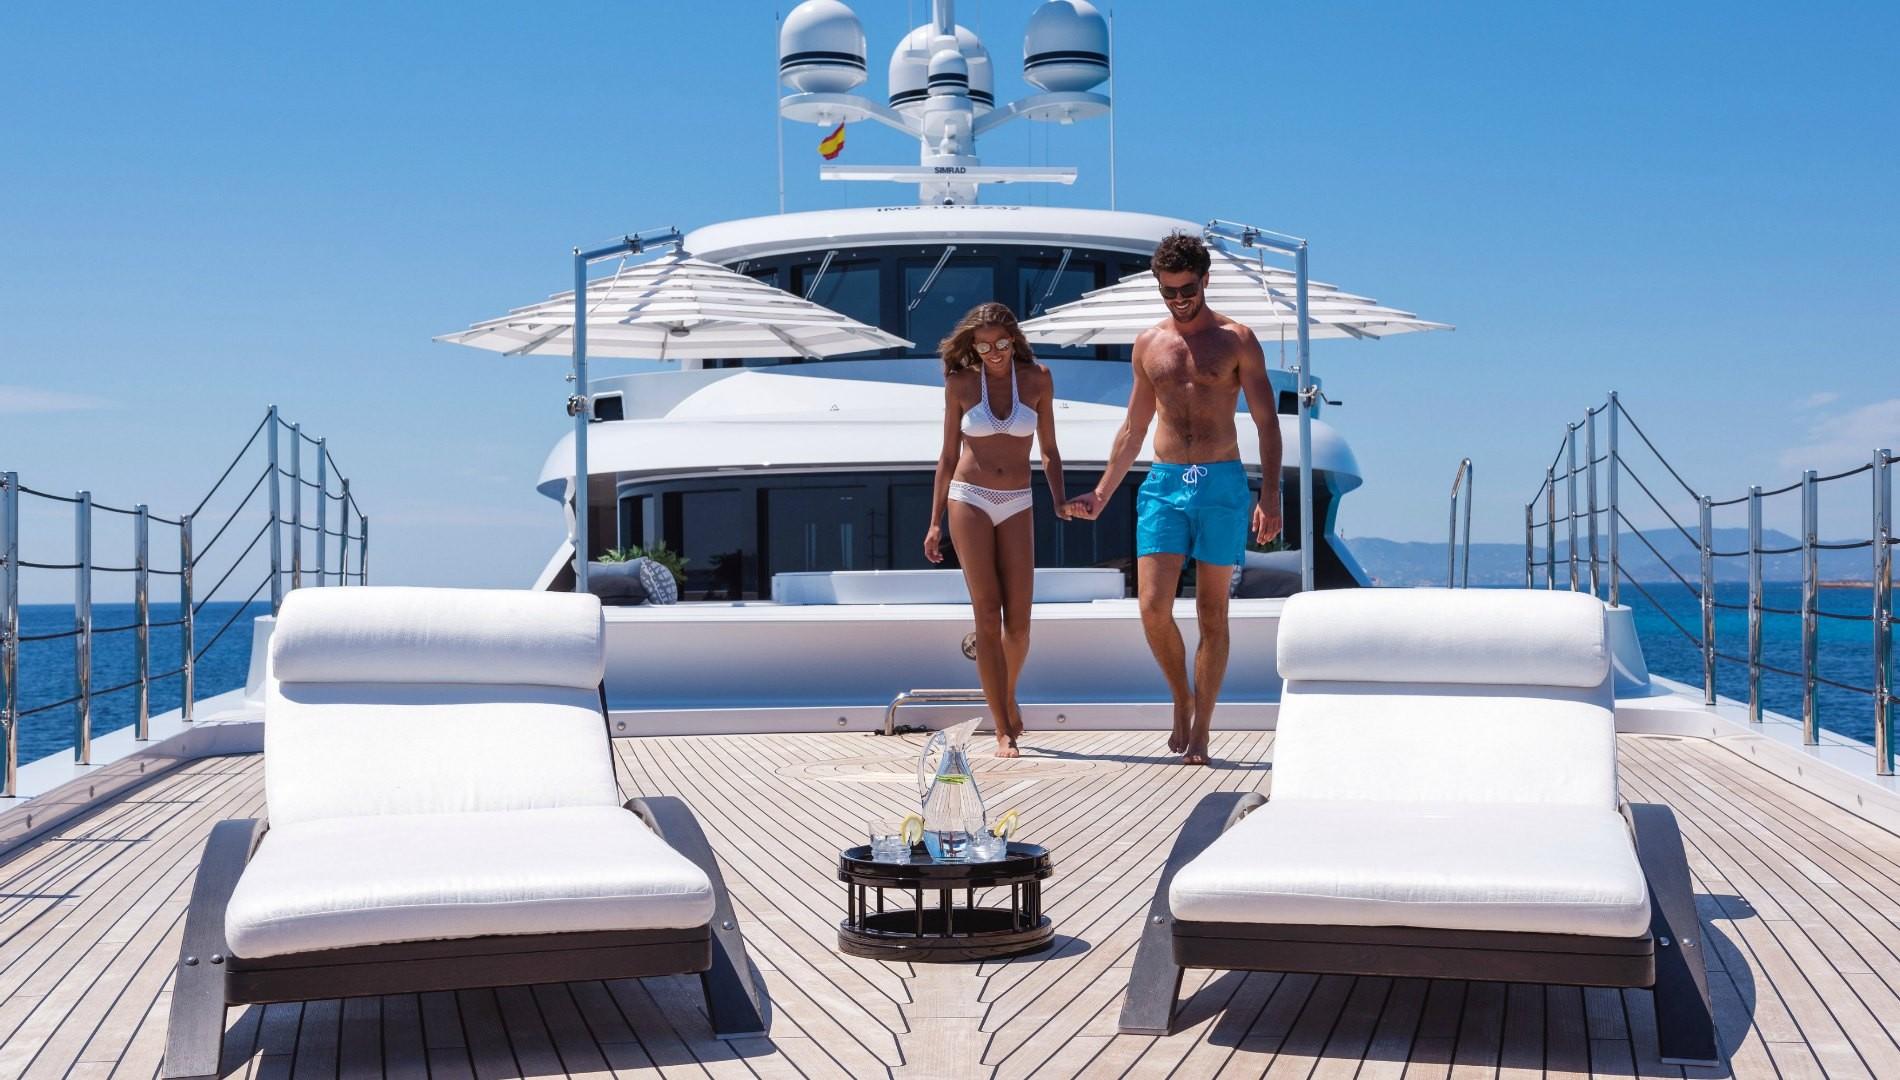 Luxury holidays aboard motor yacht 11 11 © Jeff Brown